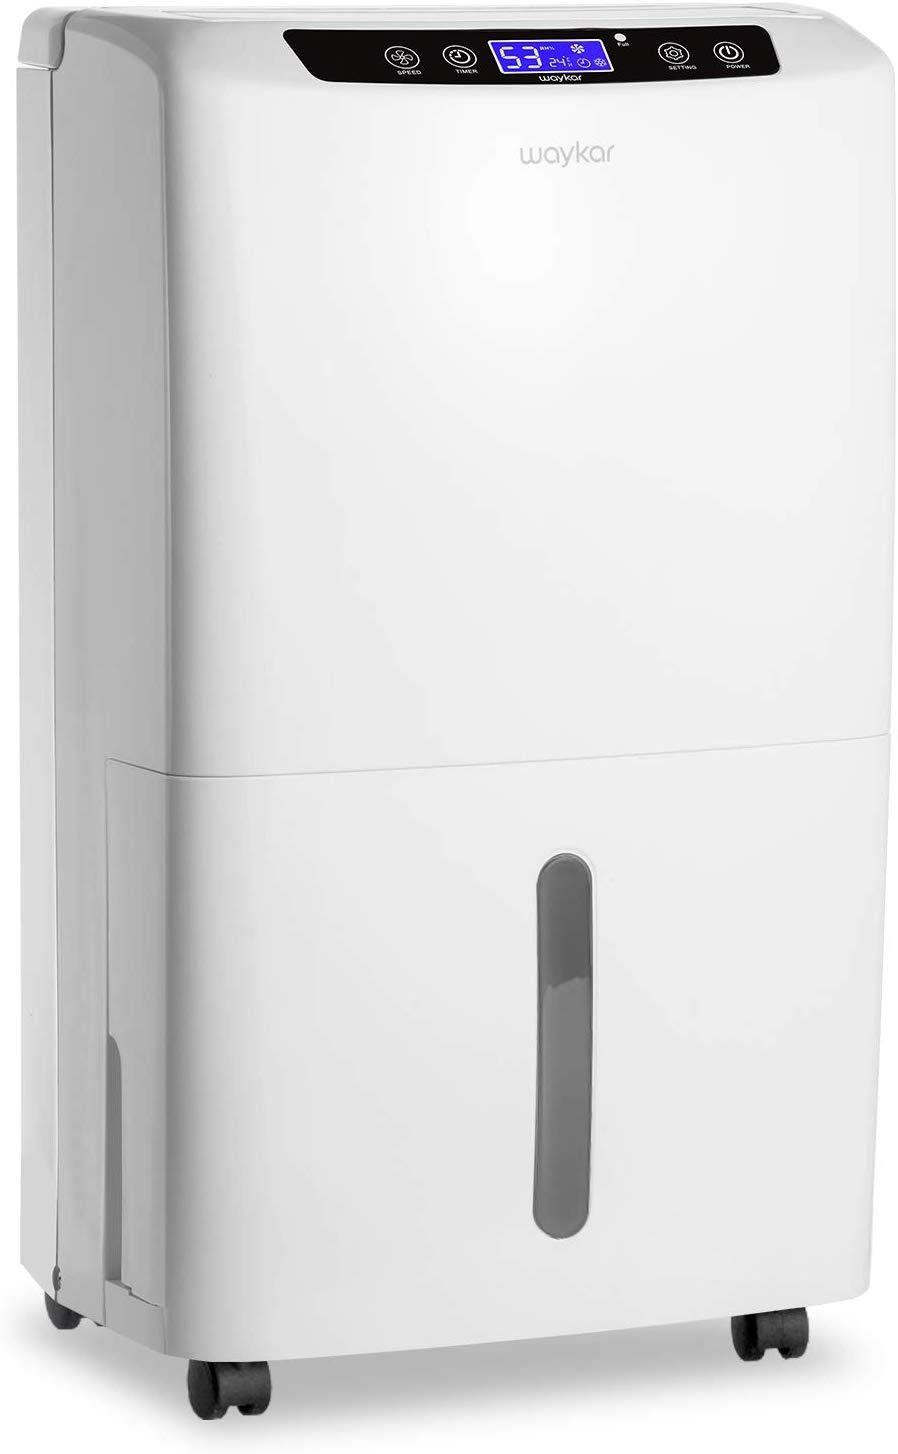 Waykar 40 Pint Dehumidifier For Home Basements Bedroom With Drain